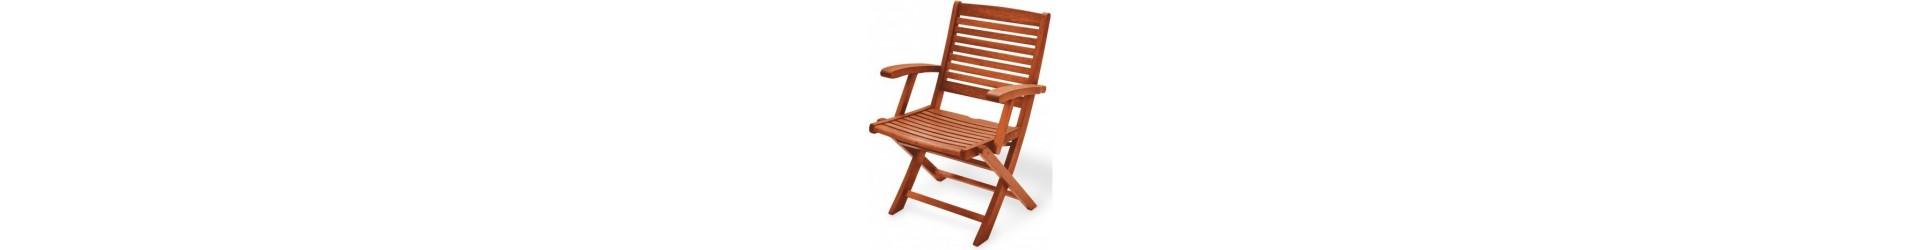 Chaises de jardin, meubles de jardin